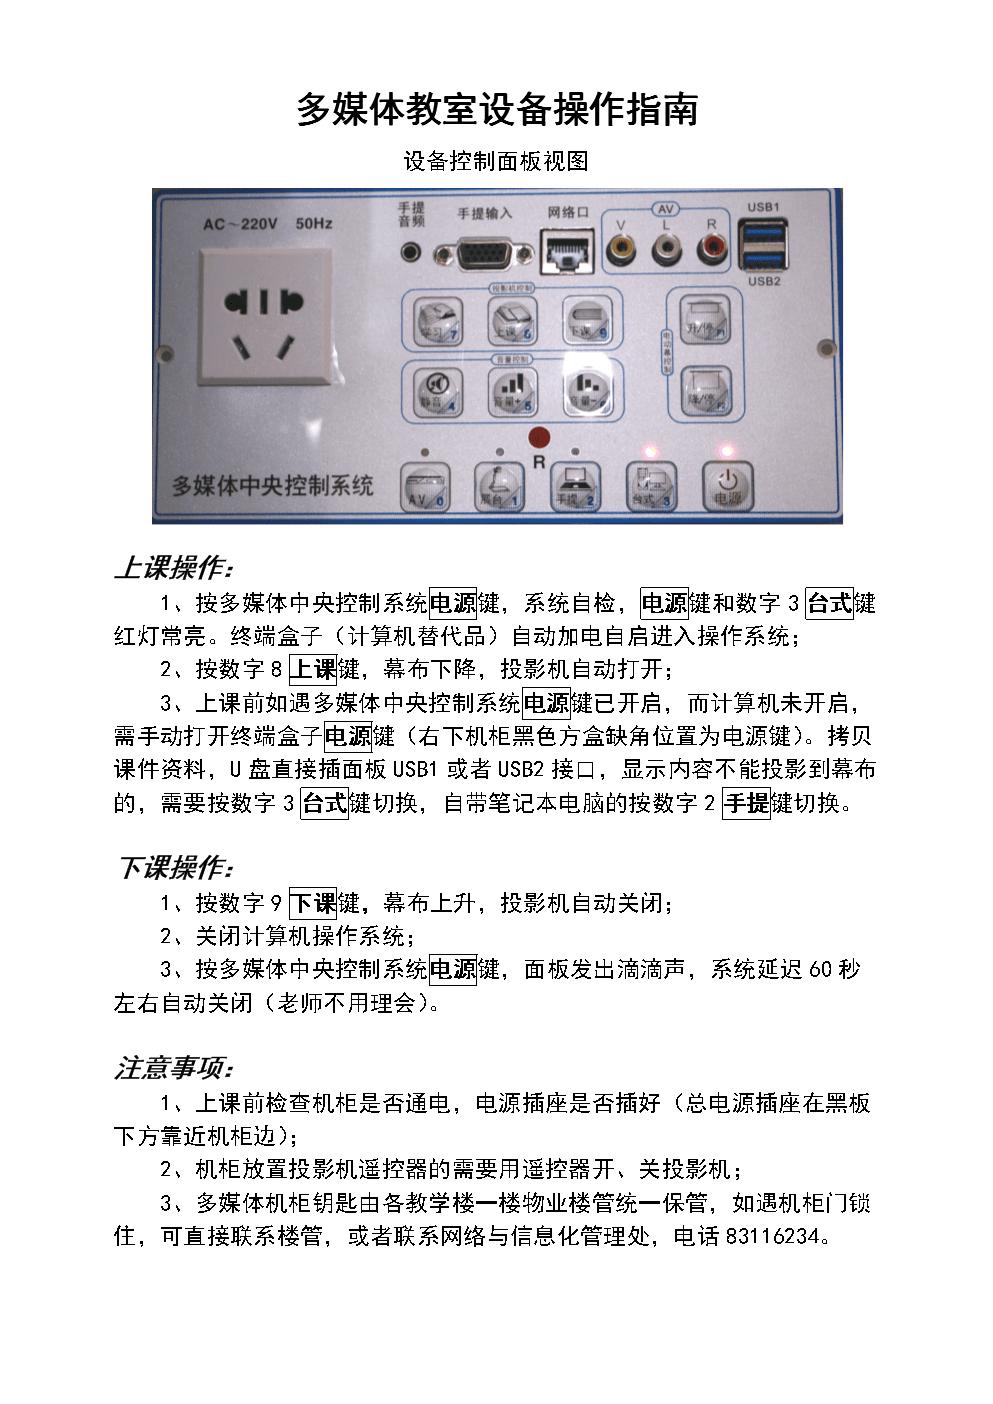 HS-350A新建多媒体教室设备操作指南.docx